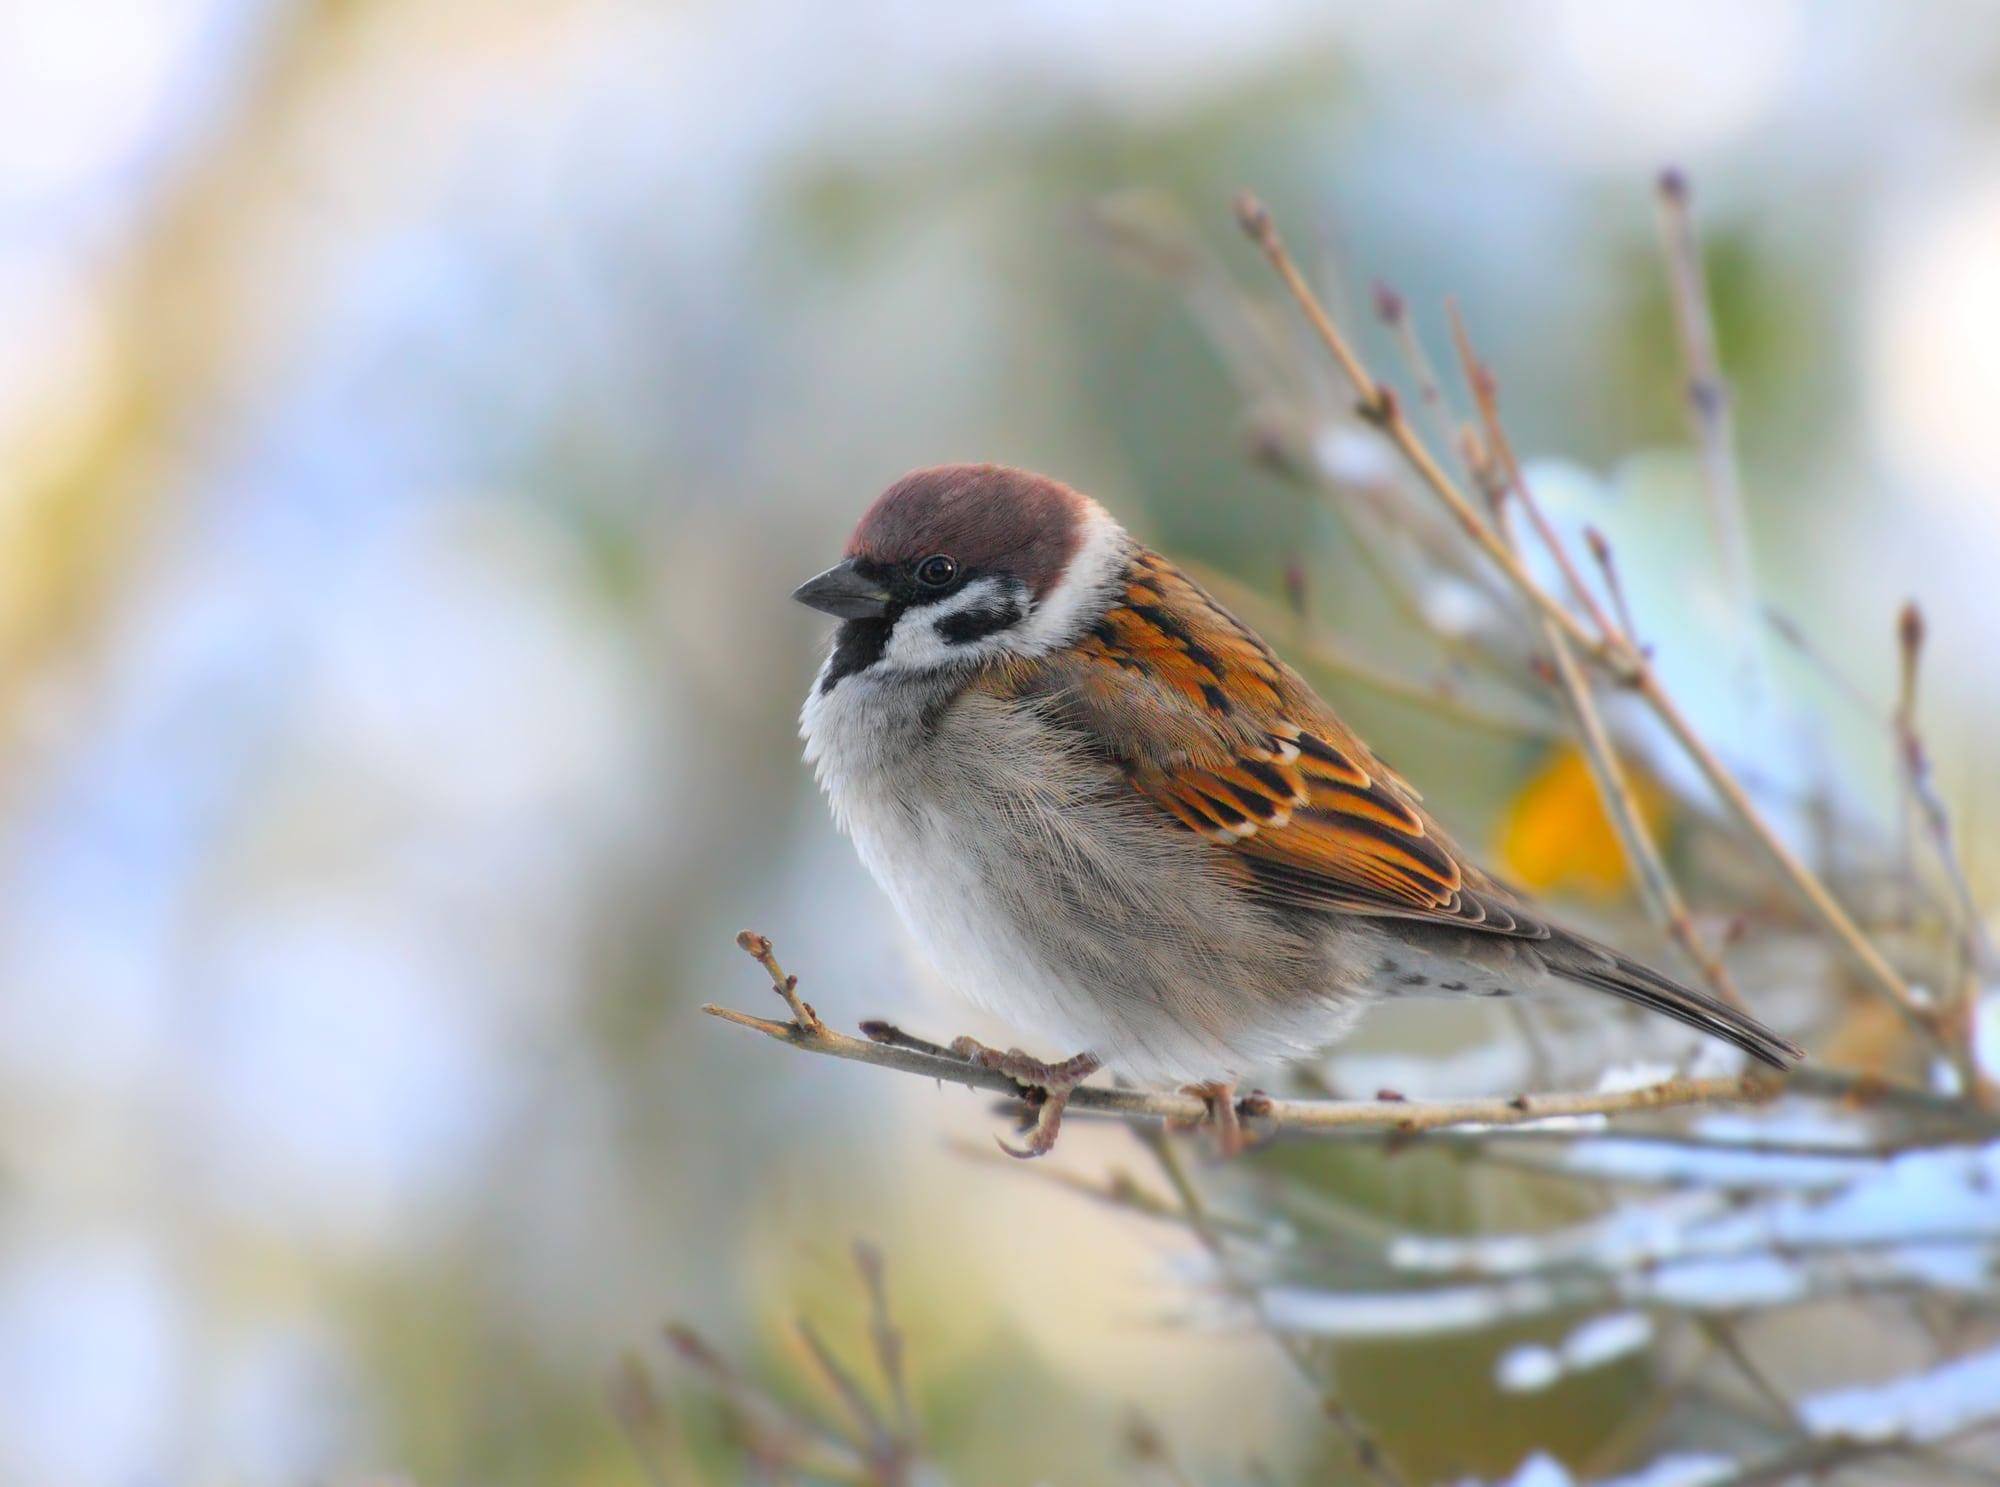 A male house sparrow on a twig